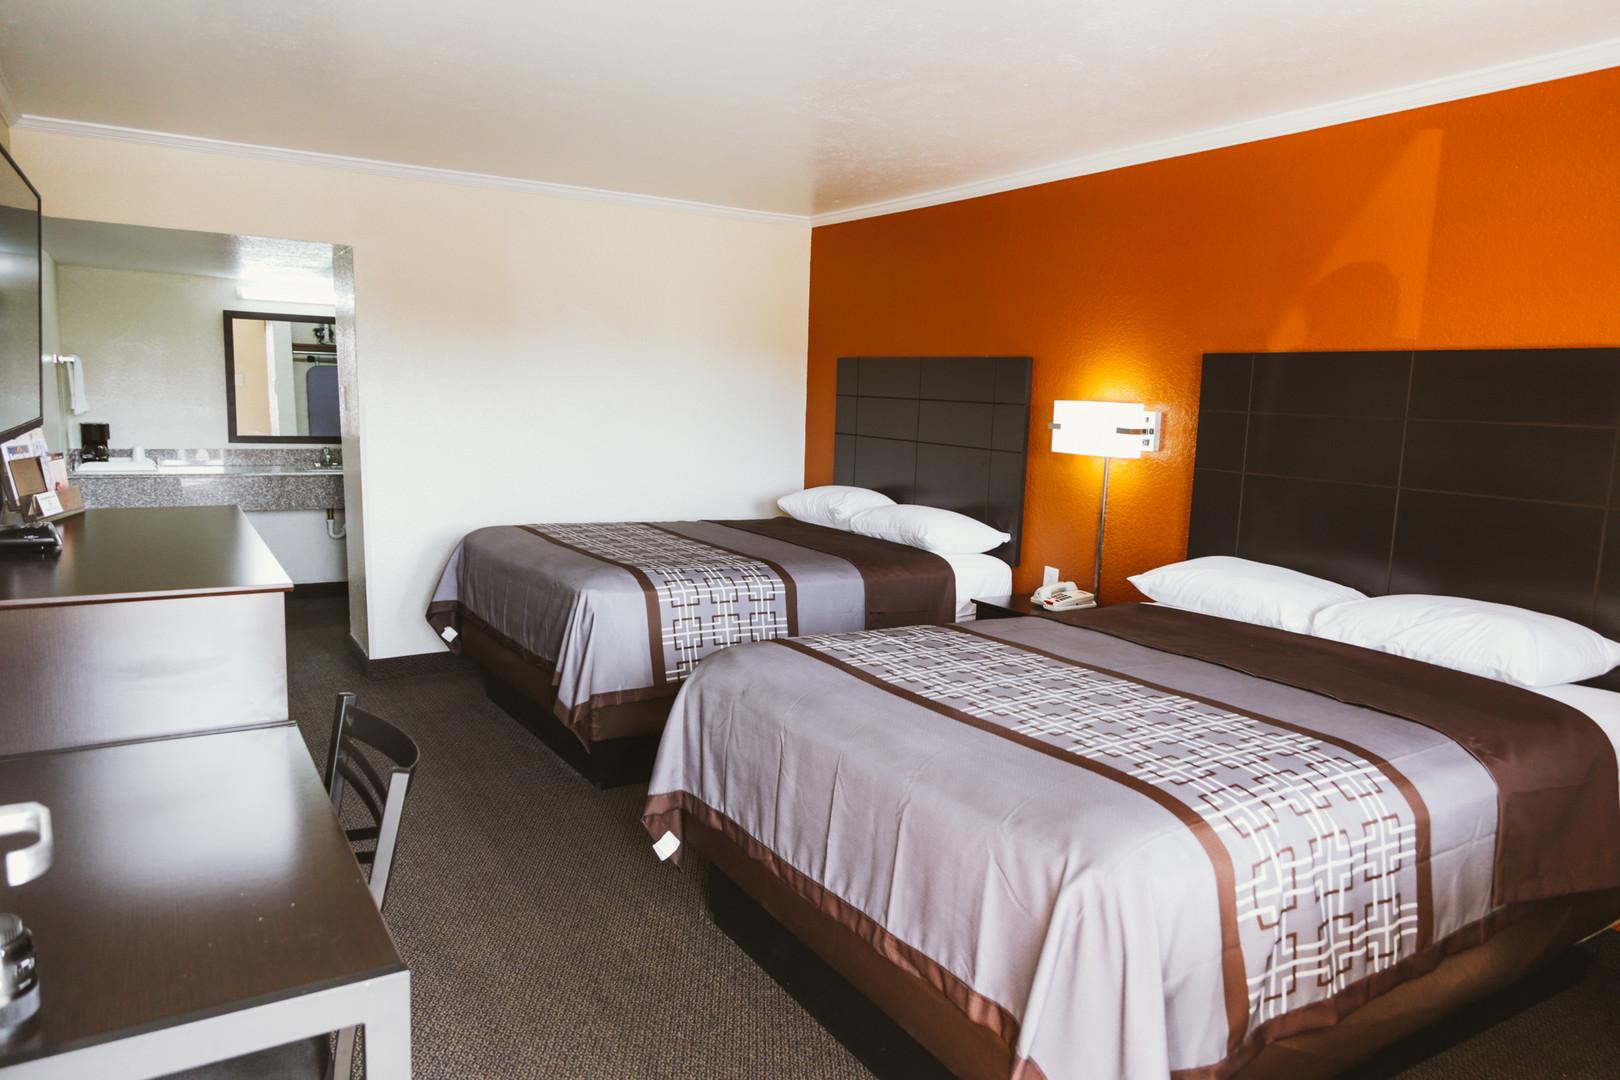 Lufkin Inn Room Photos-15.jpg